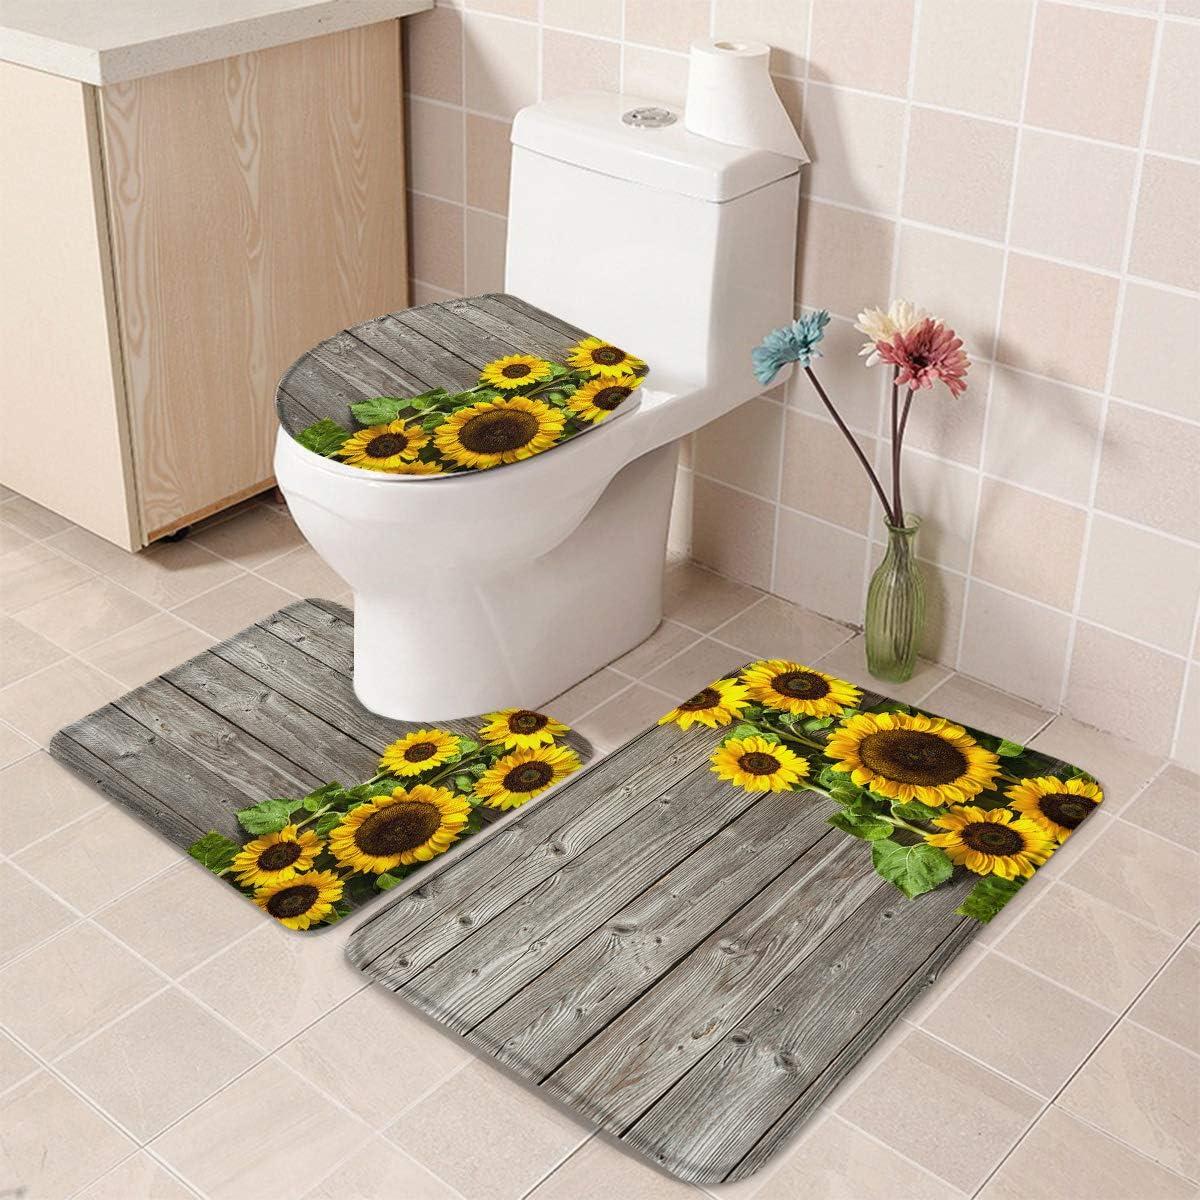 3 Pieces Bathroom Rug Set 卓出 Washable 大注目 Decoration Cover Floor Co